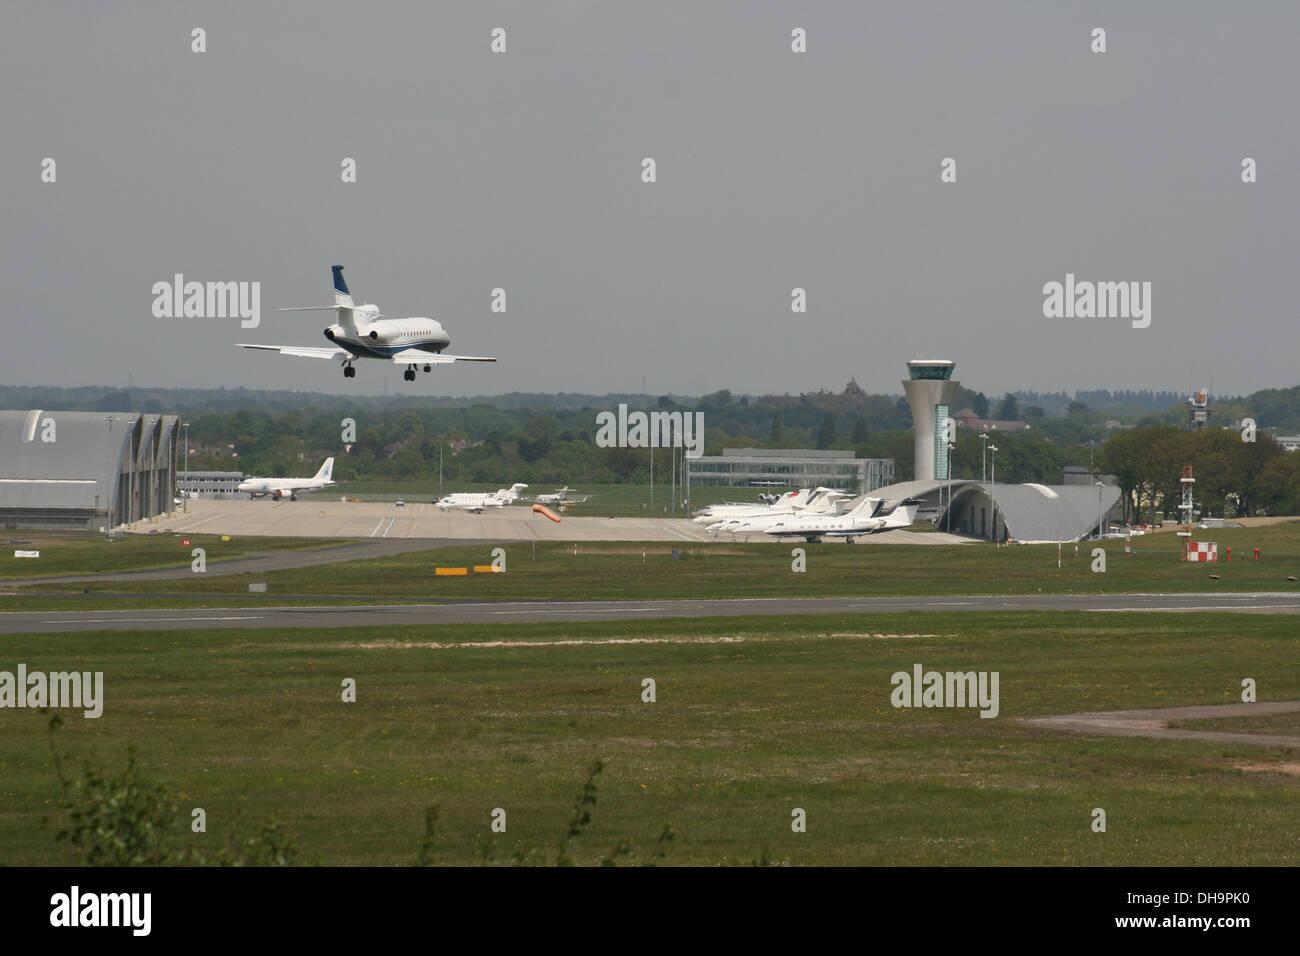 FARNBOROUGH AIRPORT AIRFIELD HAMPSHIRE ENGLAND - Stock Image